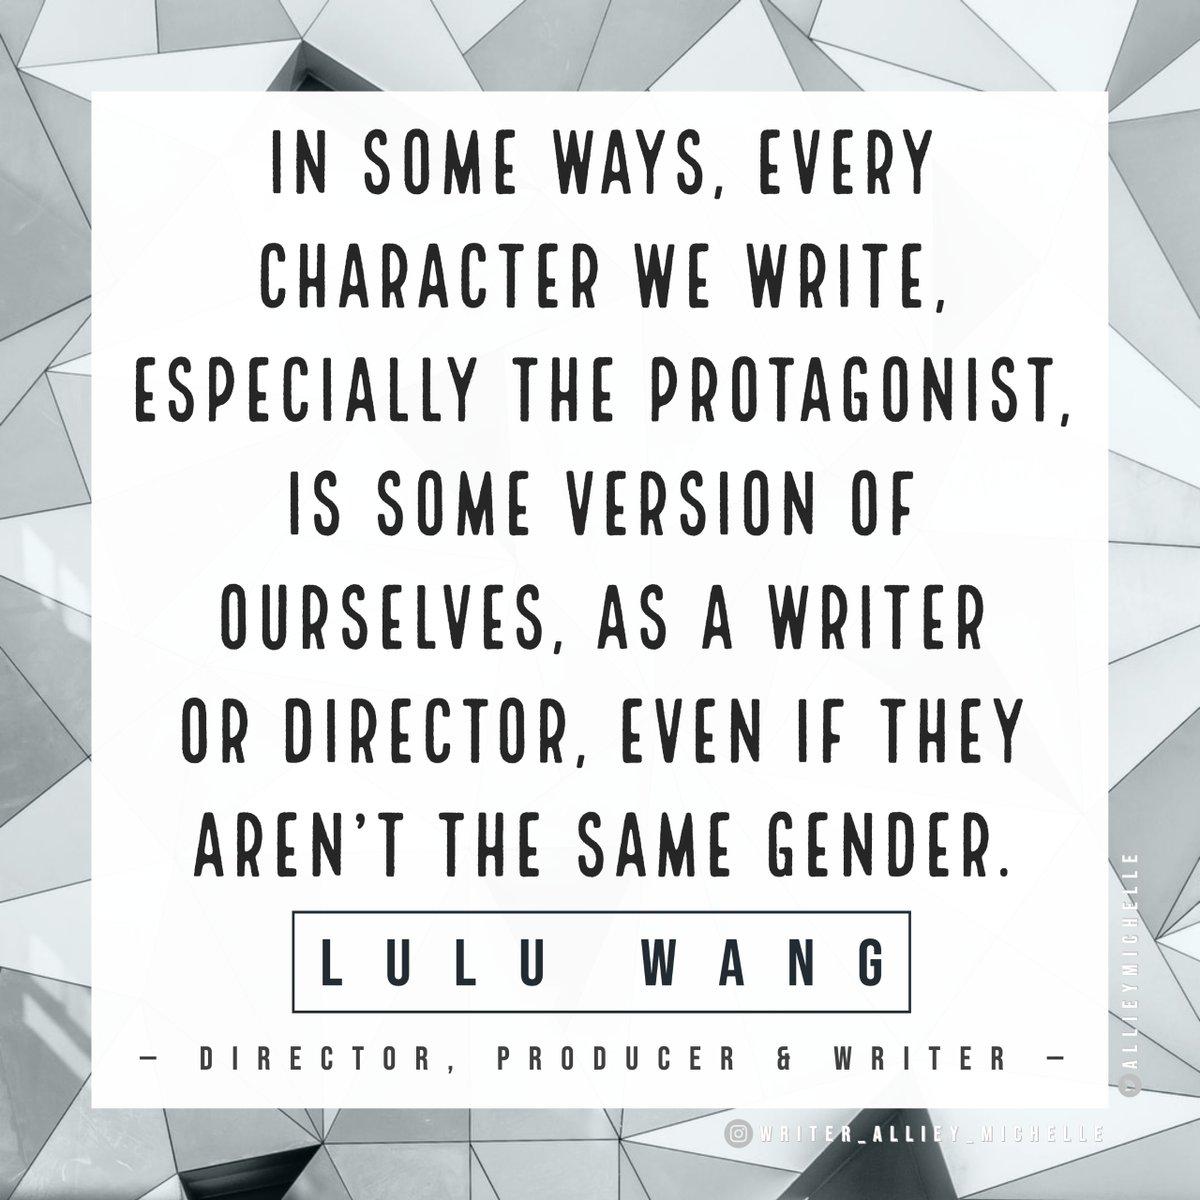 "#WednesdayWisdom courtesy of Lulu Wang (@thumbelulu), best known for ""Posthumous"" (2014), ""Touch"" (2015) & ""The Farewell"" (2019).  #QOTD #quotestoliveby #wordsofwisdom #writer #writingcommunity #writingadvice #writing #WomenInFilm #FemaleFilmmakers #directedbywomen https://t.co/kbgaY55jkL"